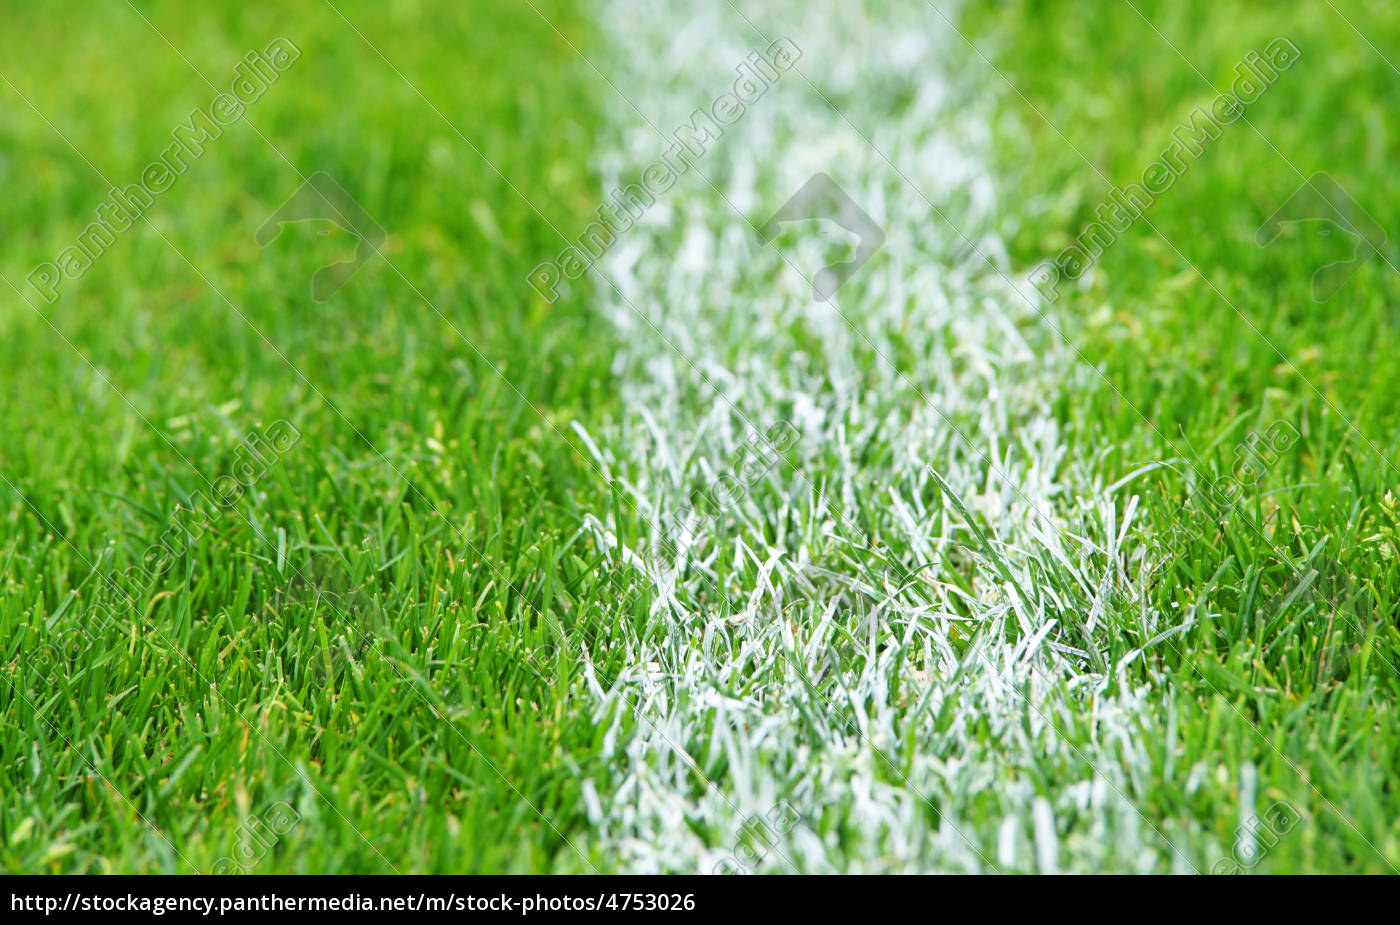 fu ball rasen soccer grass stockfoto 4753026 bildagentur panthermedia. Black Bedroom Furniture Sets. Home Design Ideas